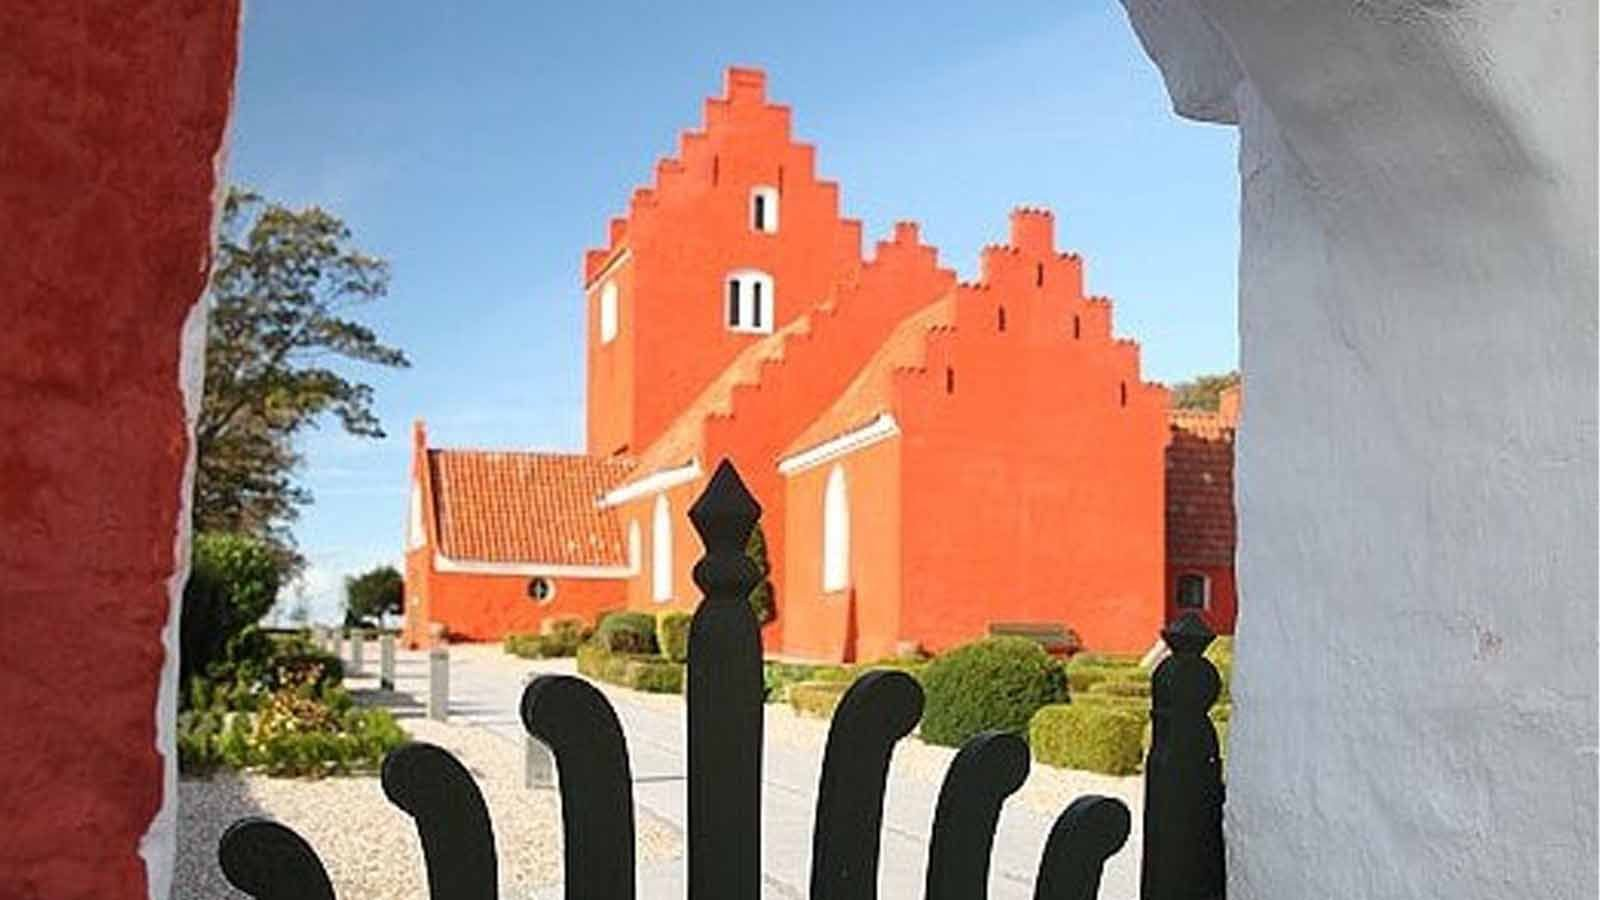 Tag med på tur til Odden og Lumsås kirker